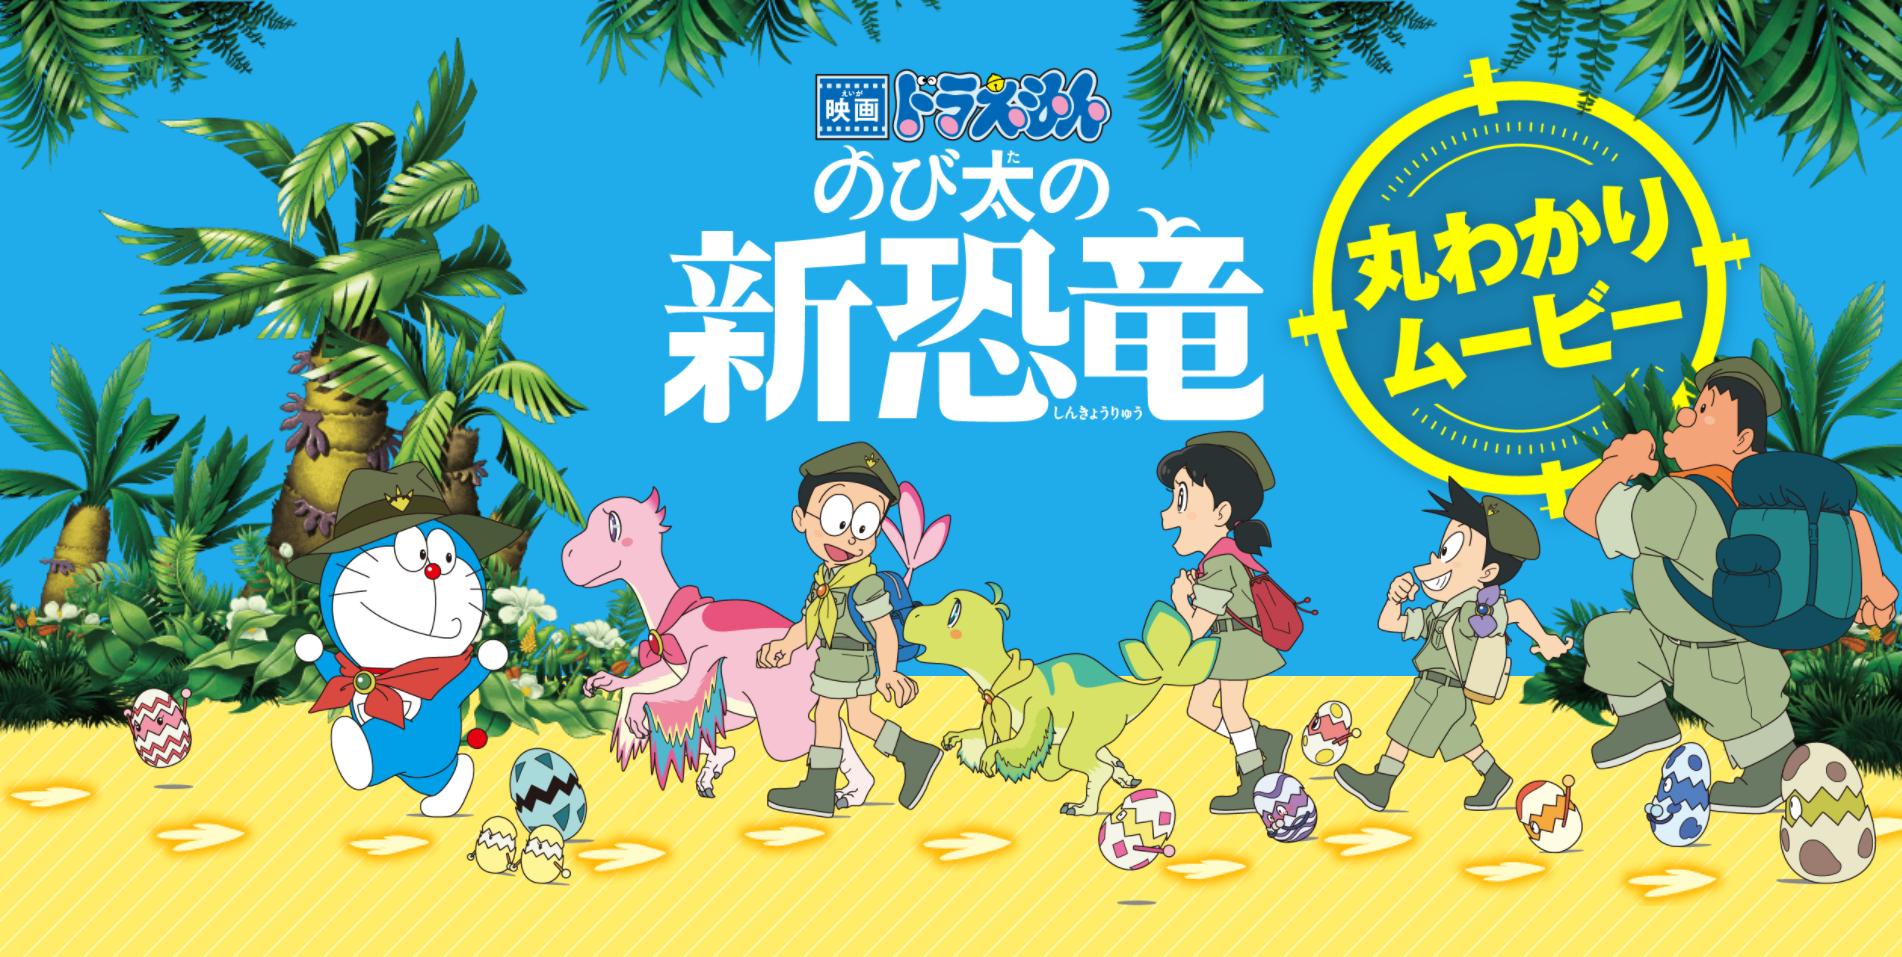 Doraemon nobita_s new dinosaur ภาคพิเศษสุดซึ้ง3